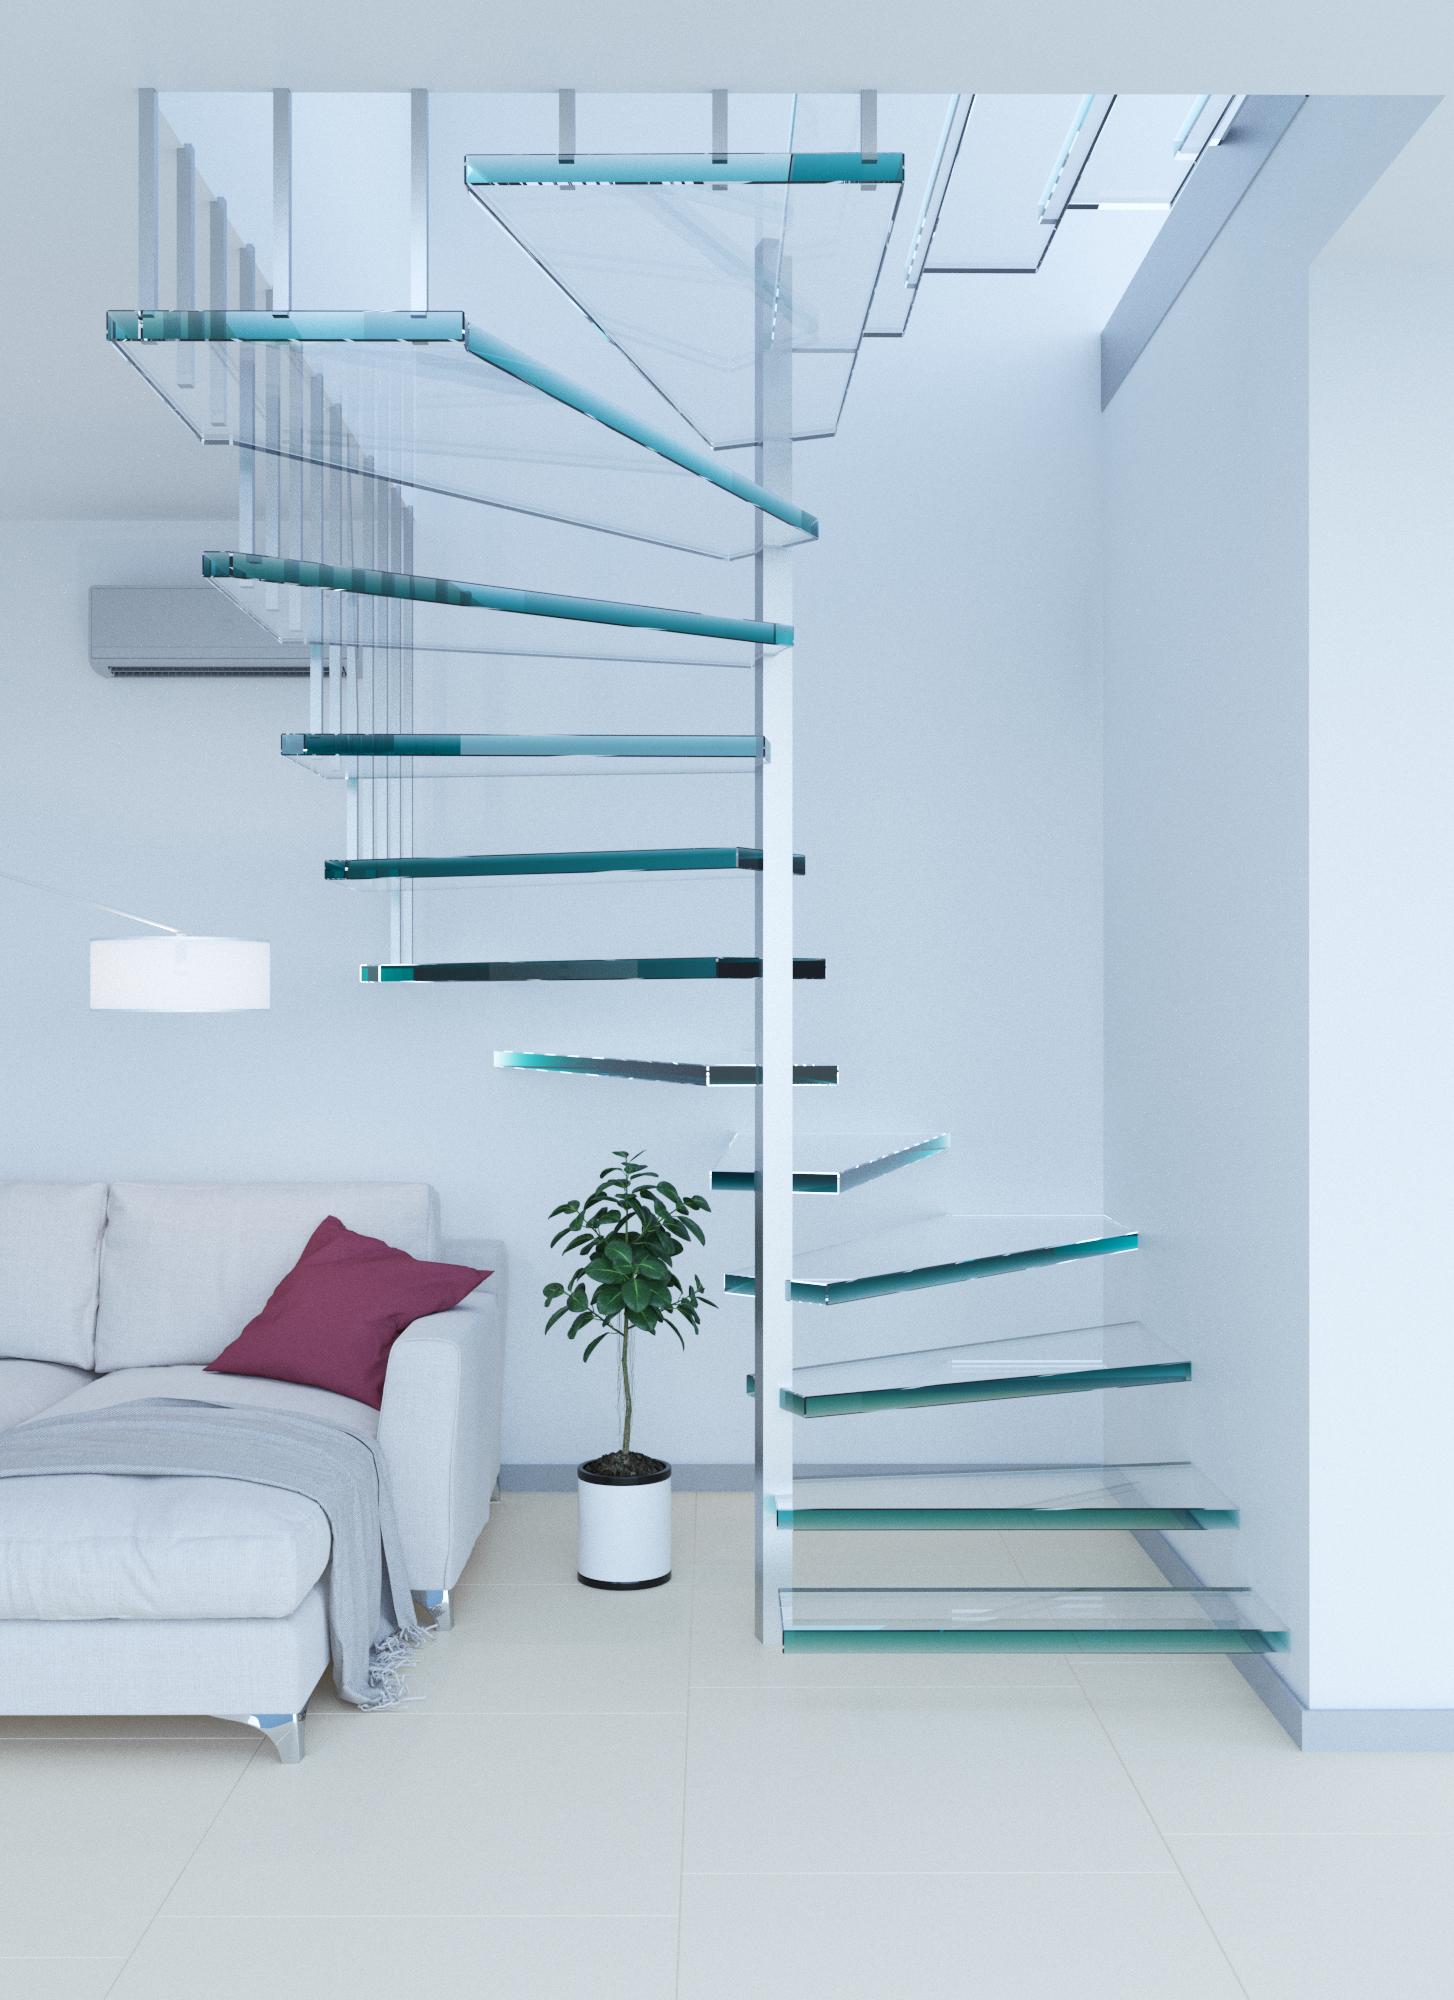 Les escaliers en verre